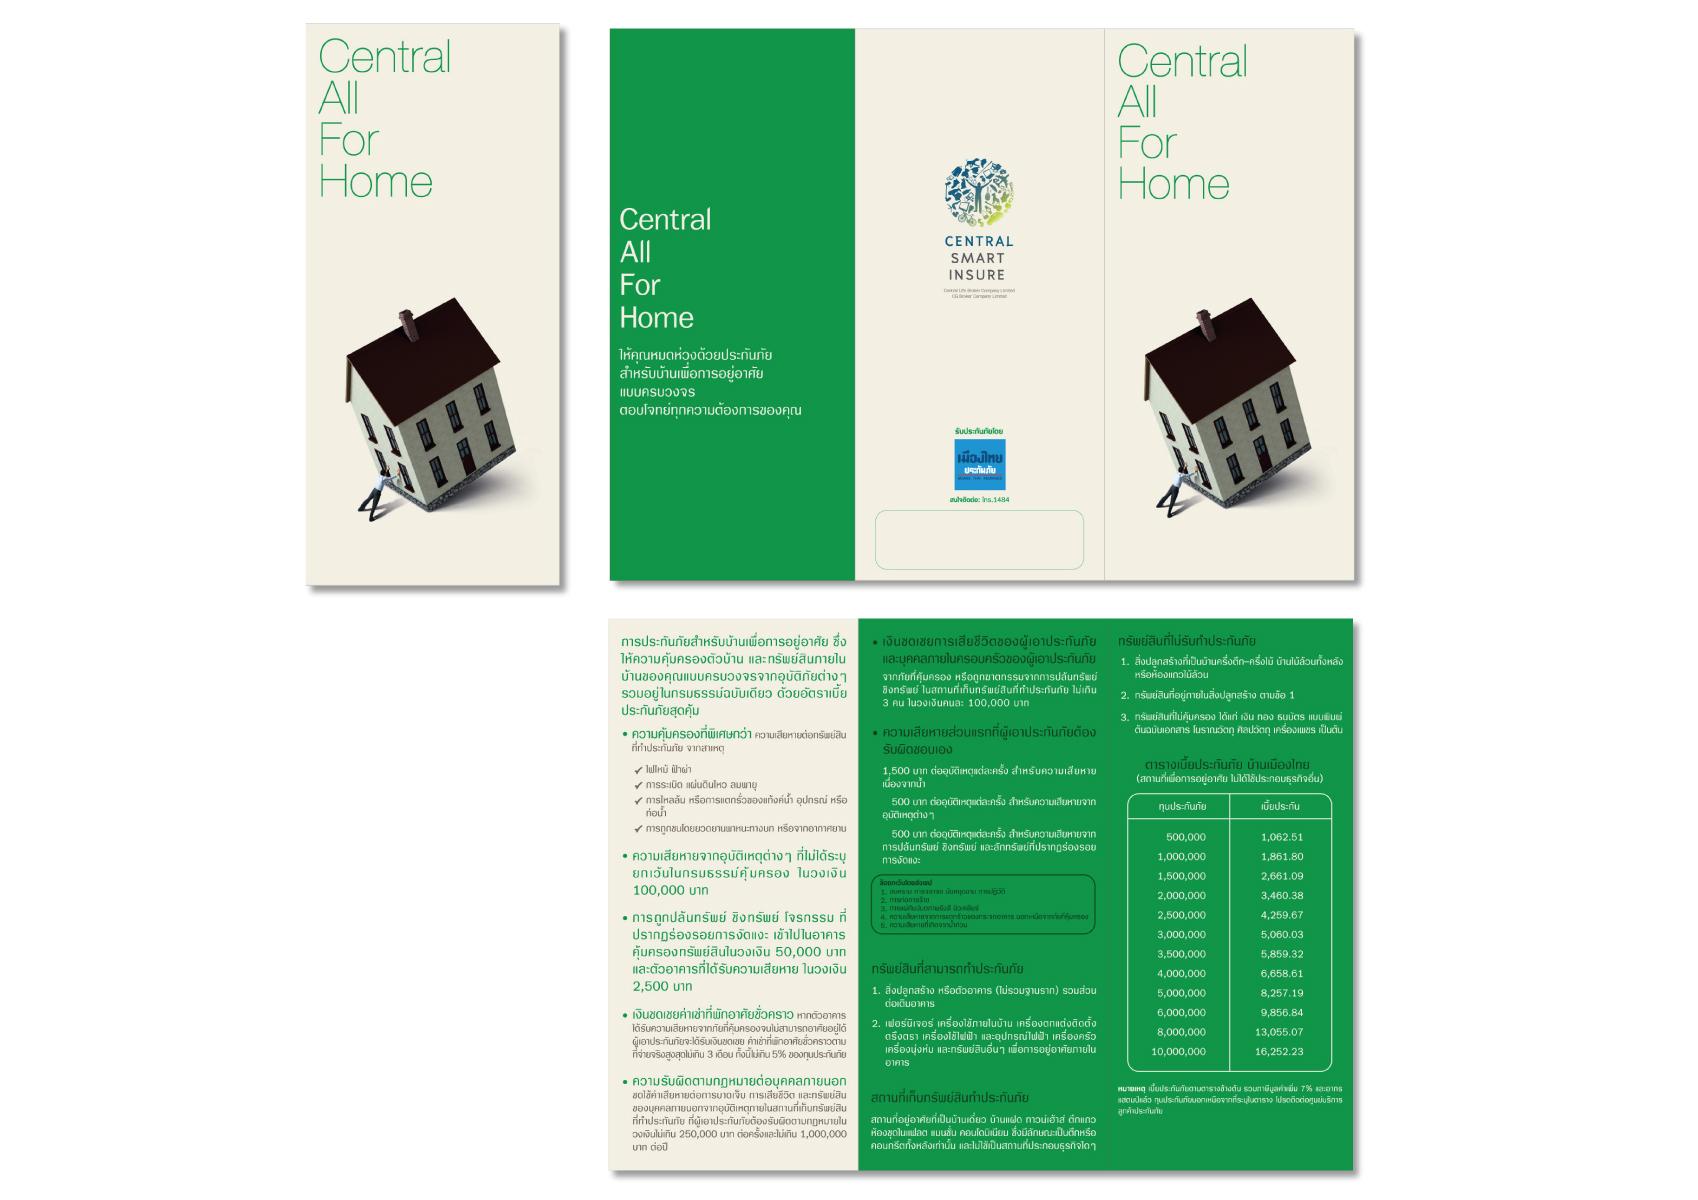 Central Smart Insure